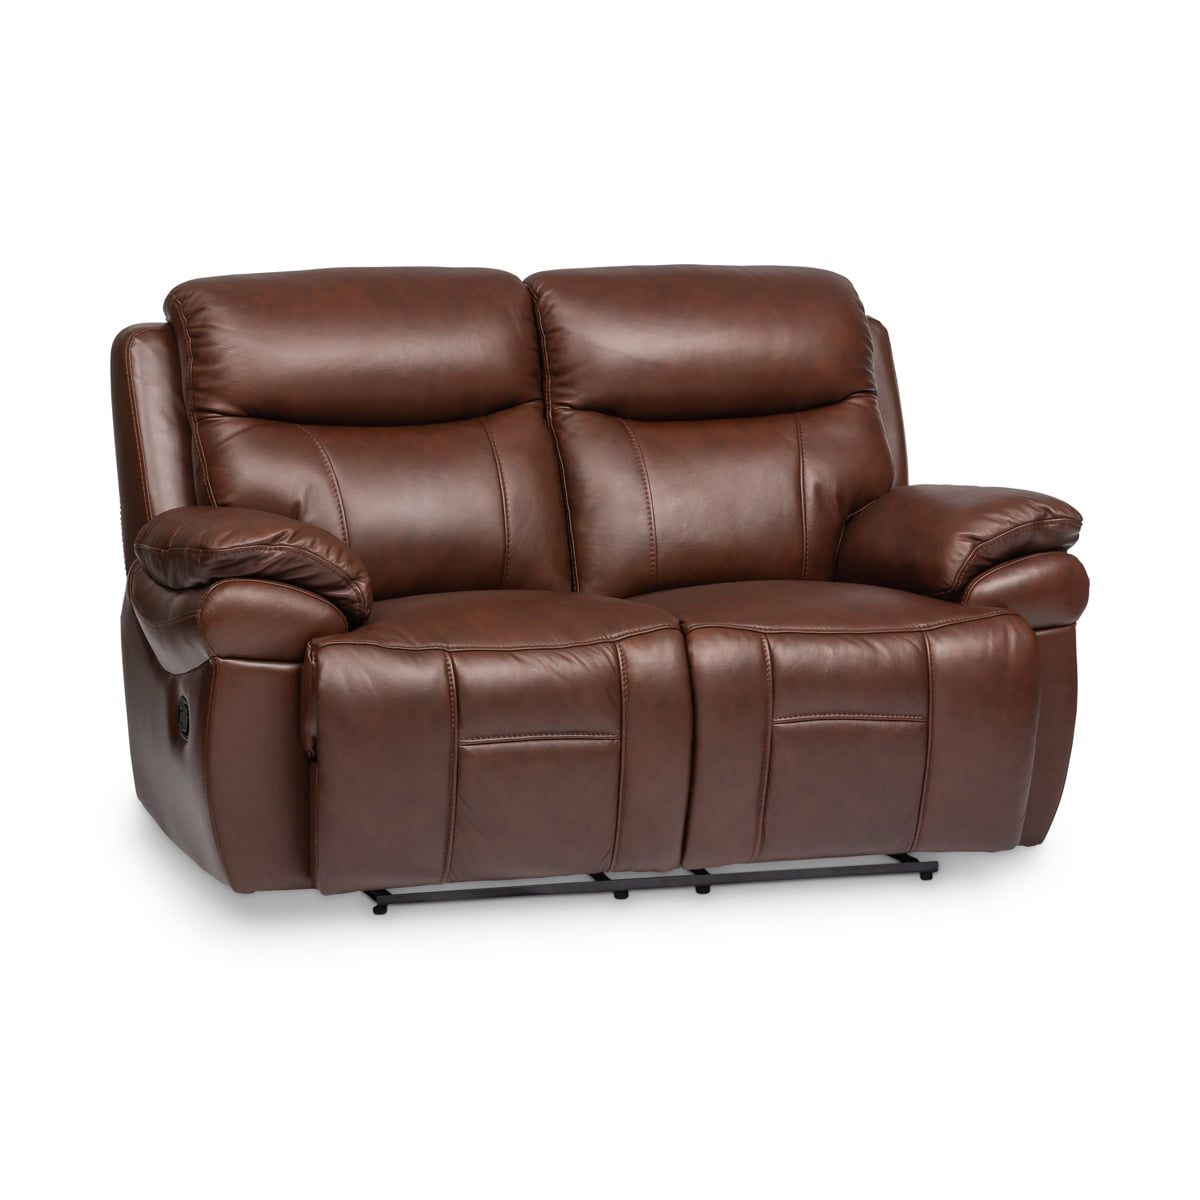 Chicago Coco 2 Seater Recliner Sofa